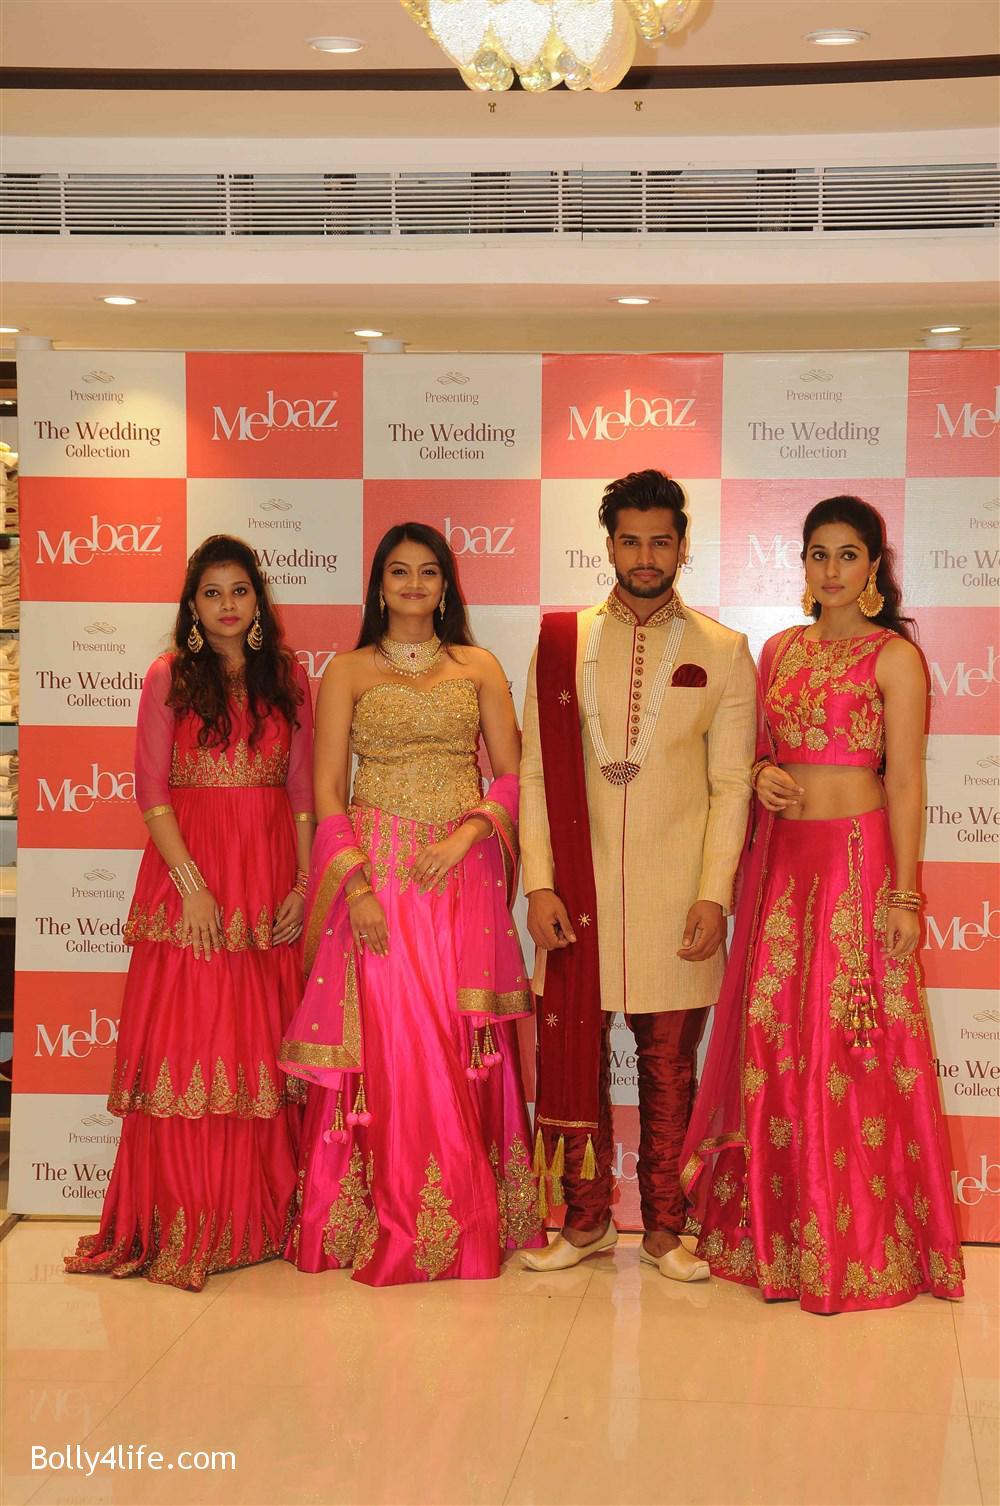 mebaz_felicitates_mr_world_2016_rohit_khandelwal_mebaz_store_bangalore_16d5553.jpg